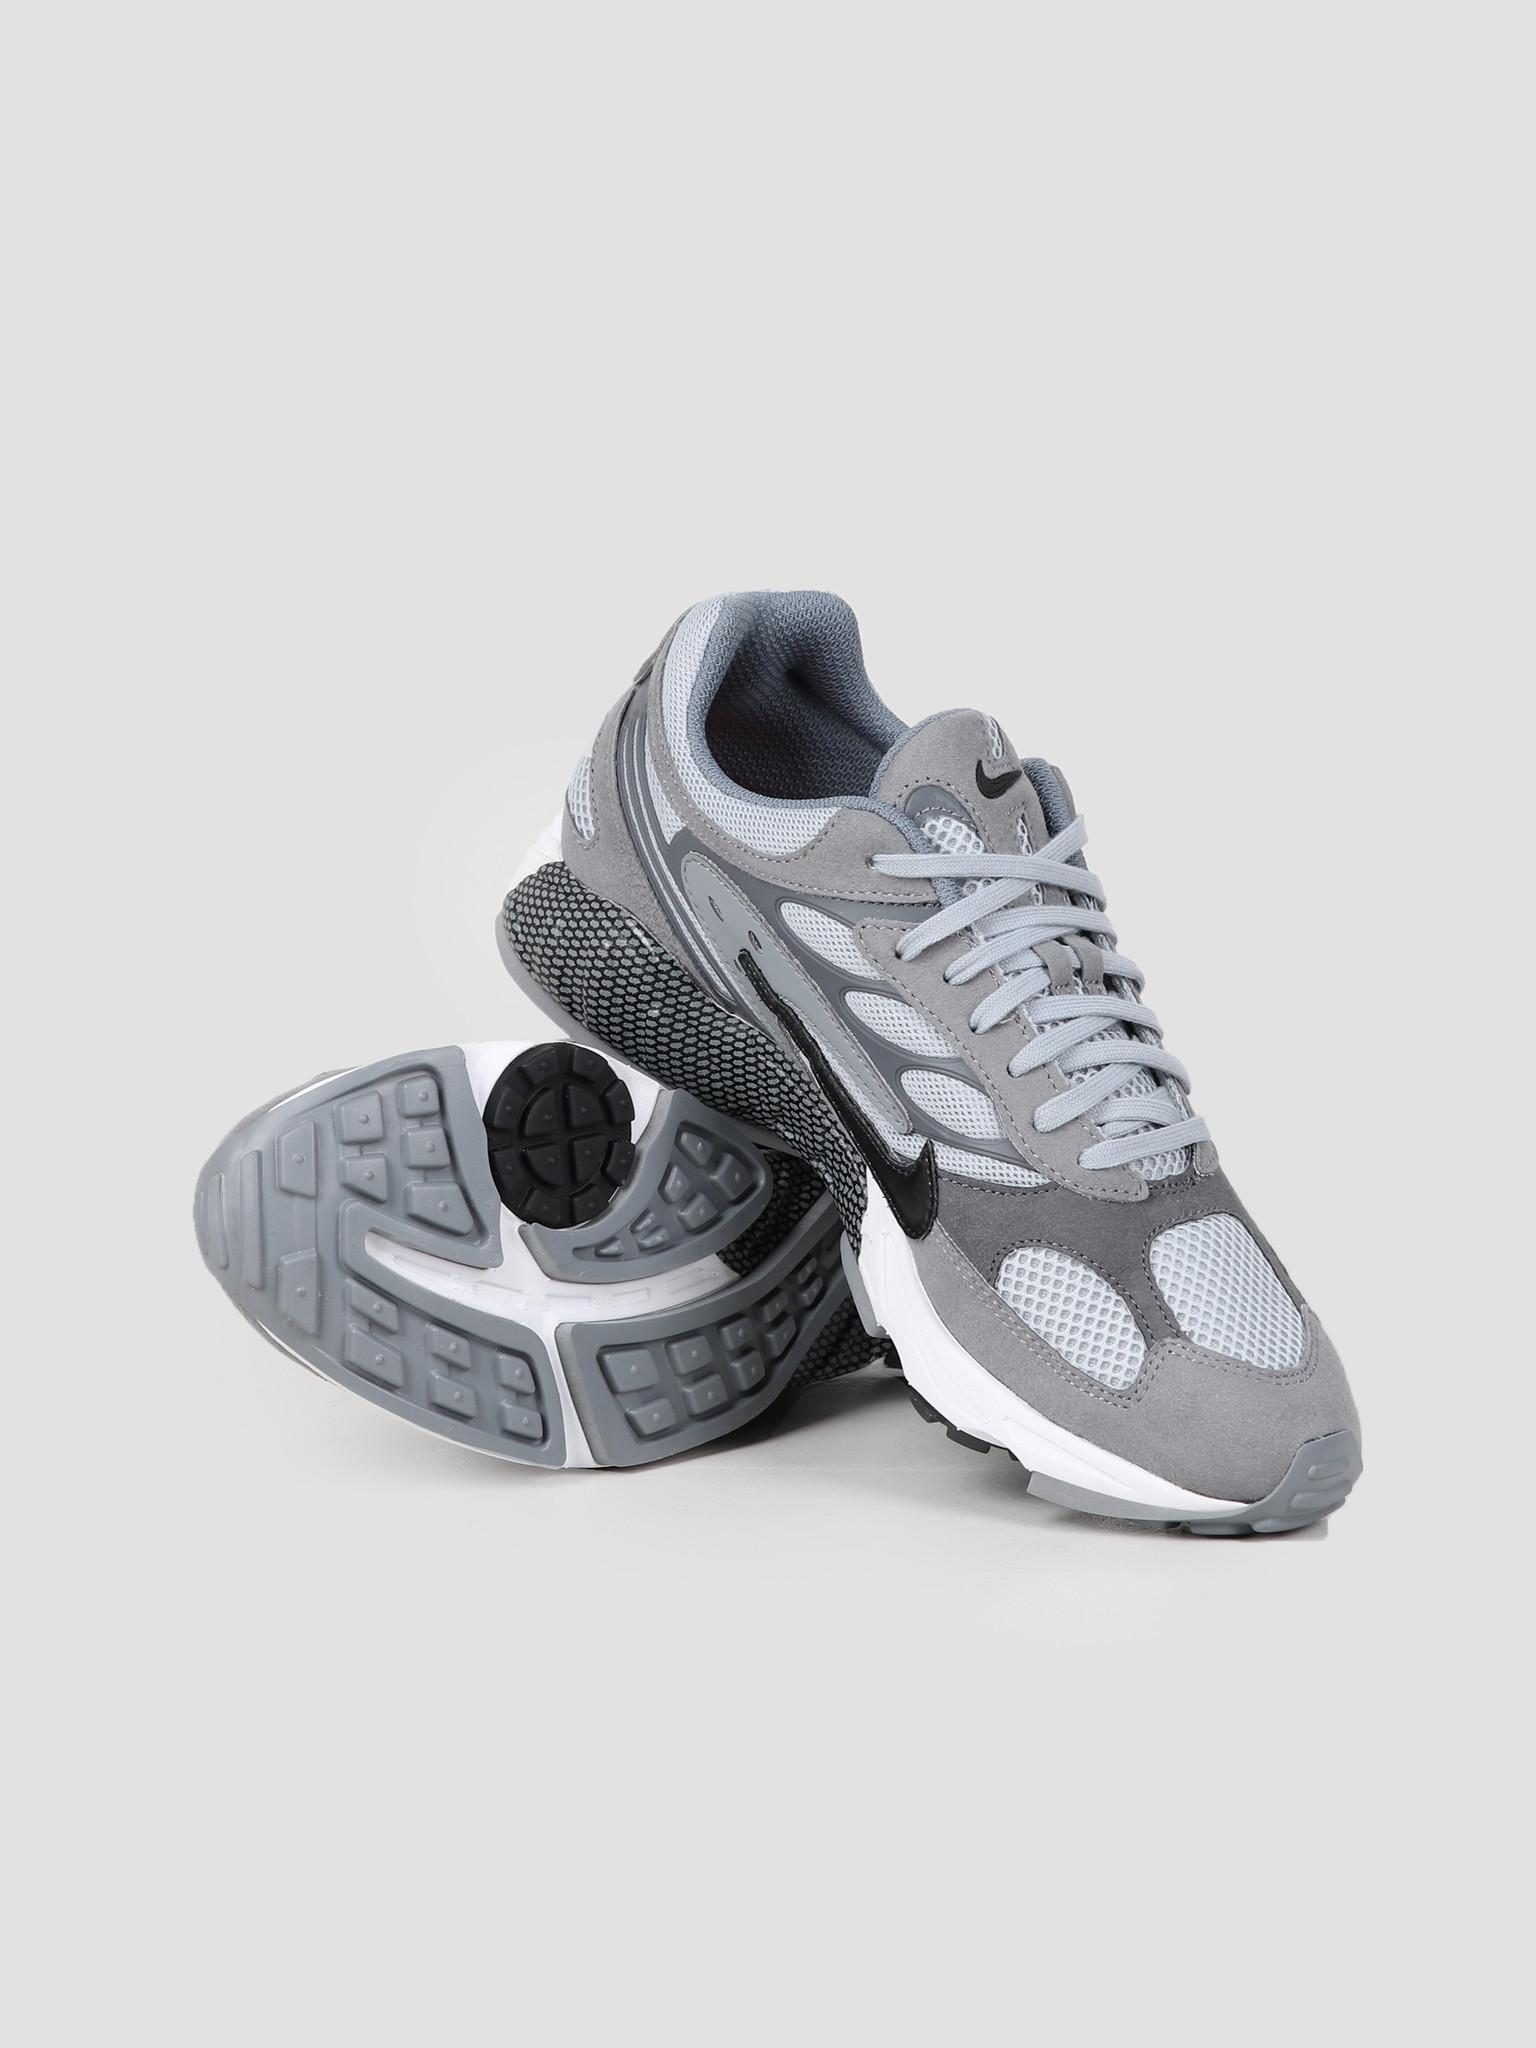 Nike Nike Air Ghost Racer Cool Grey Black Wolf Grey Dark Grey AT5410 003